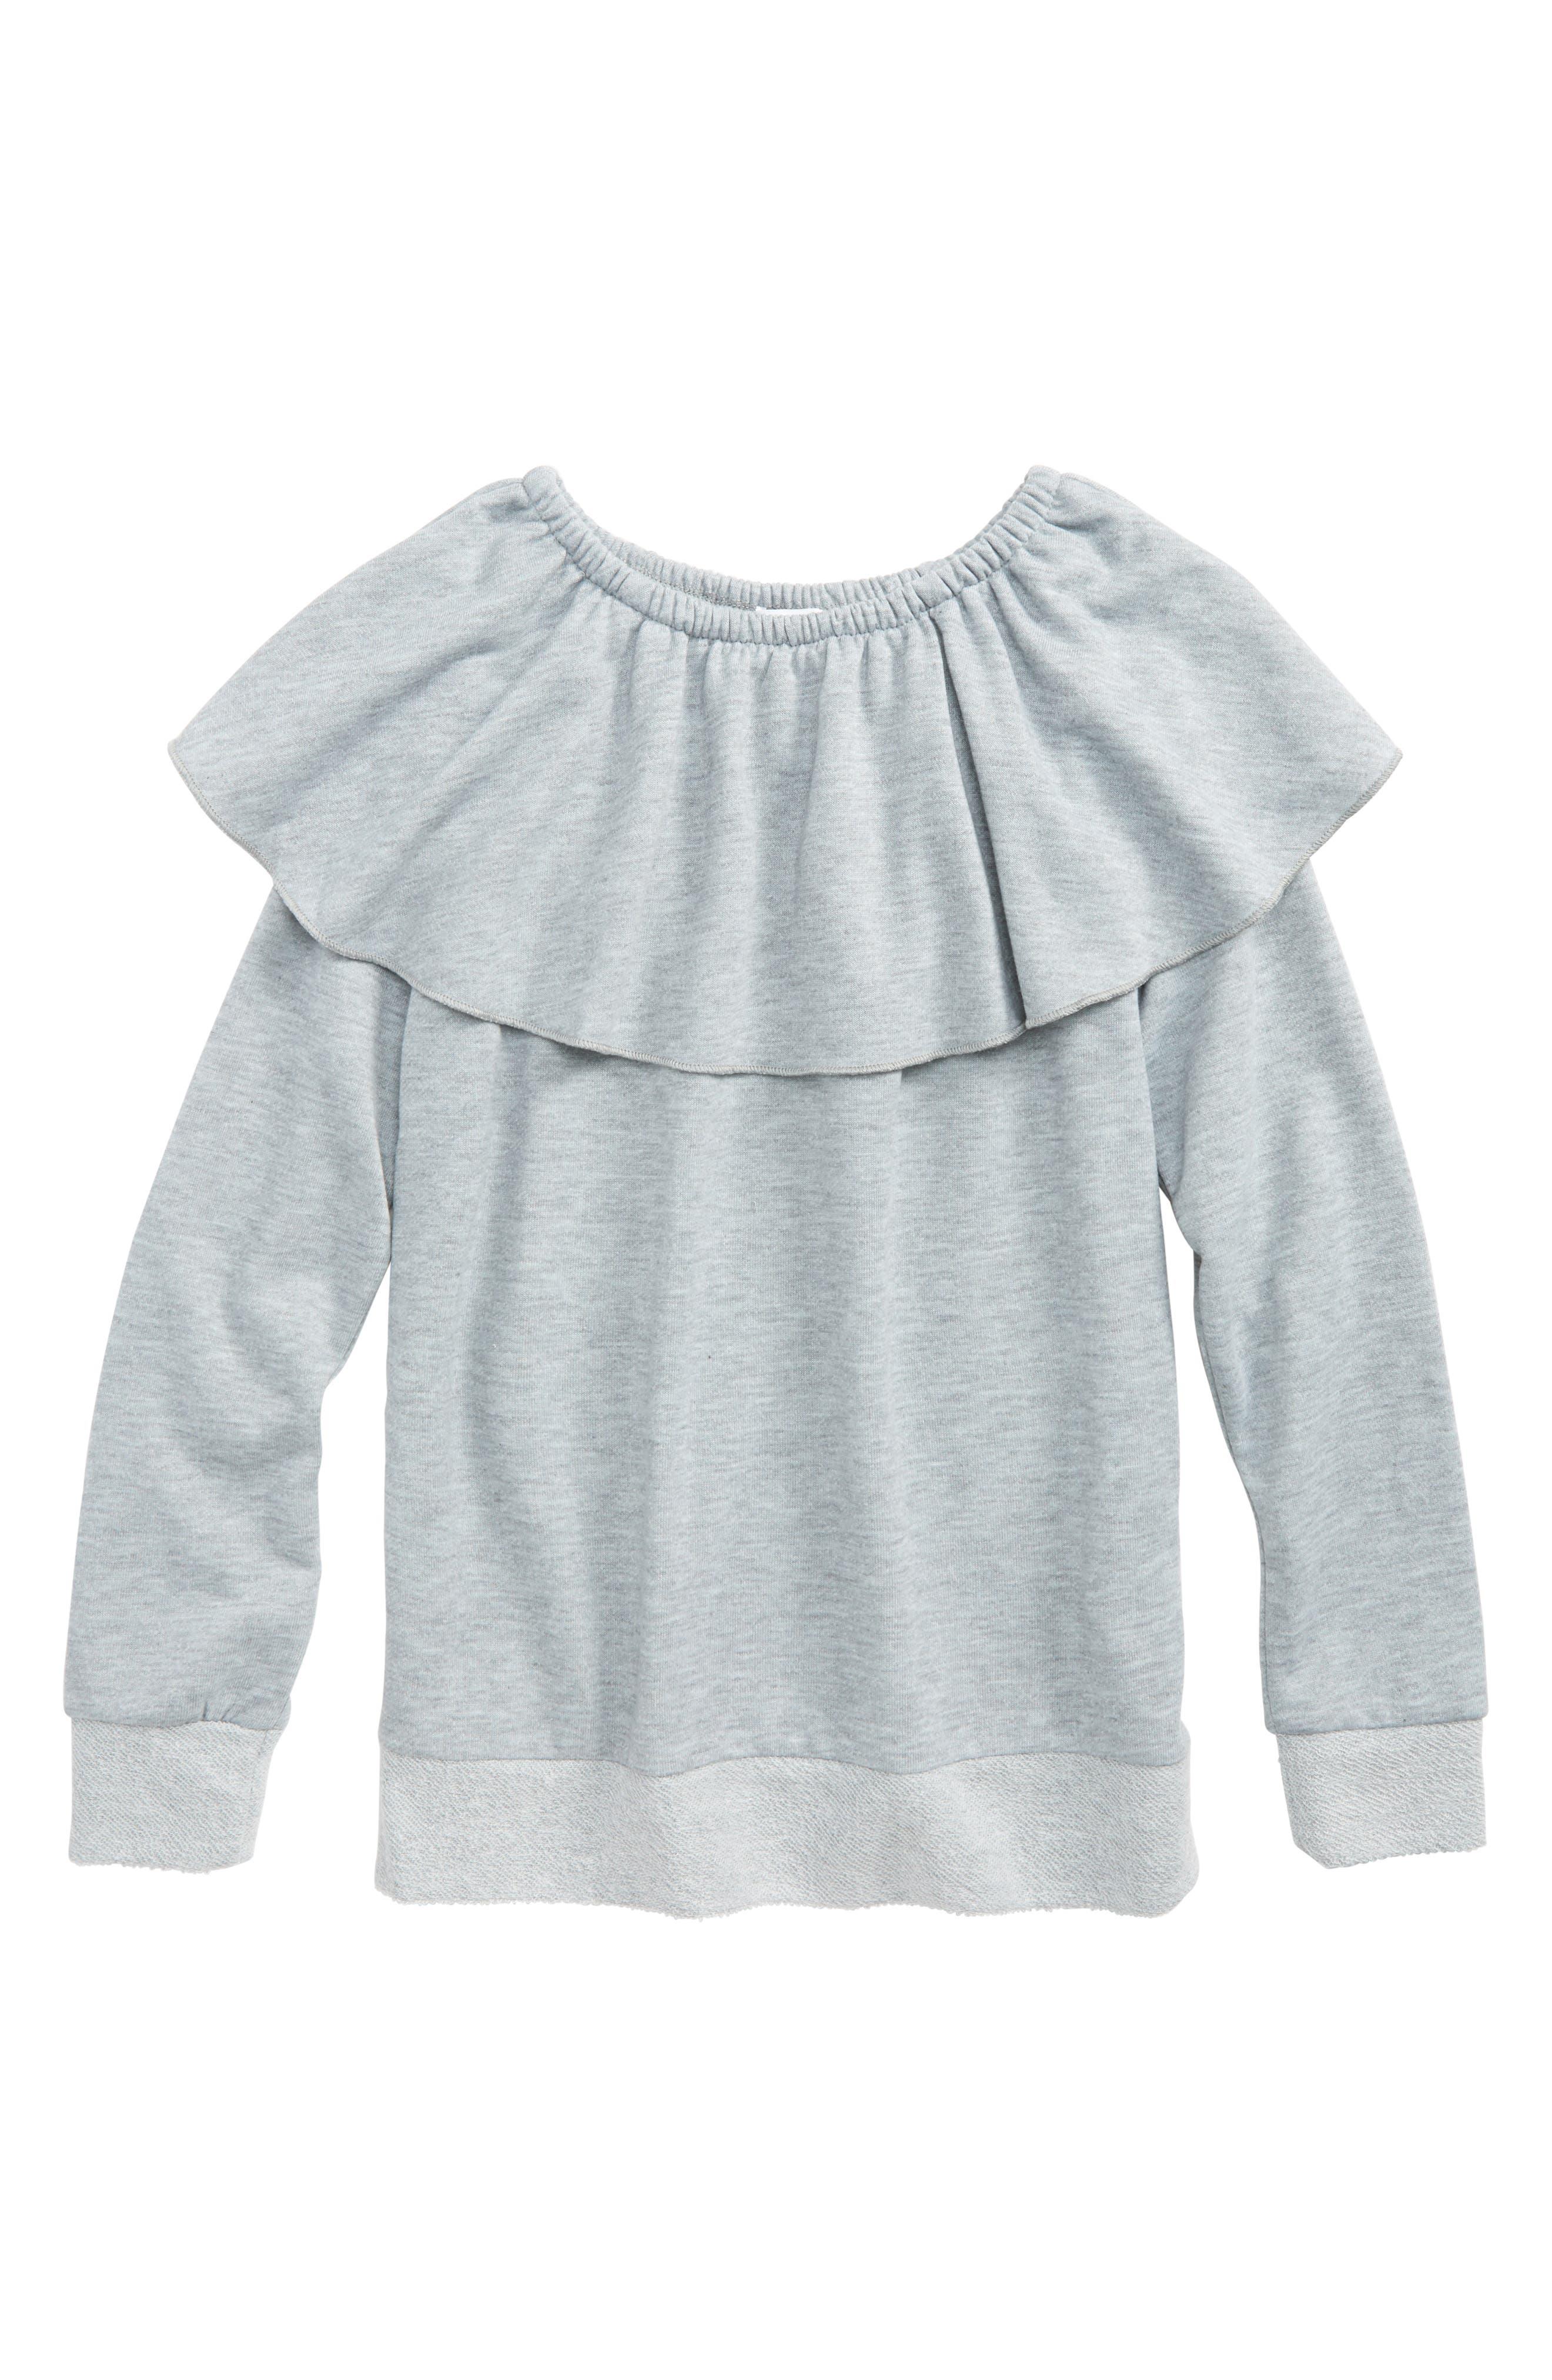 Main Image - Splendid Ruffle French Terry Sweatshirt (Big Girls)